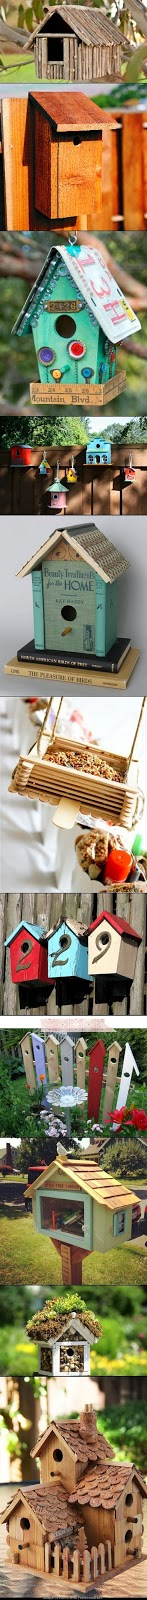 DIY Amazing Birdhouse